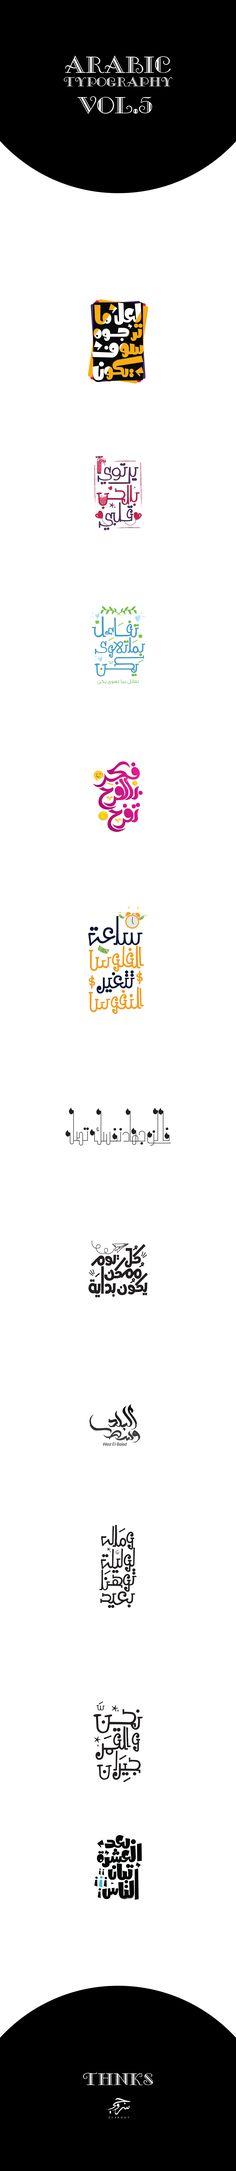 Arabic Typography Vol.5 on Behance